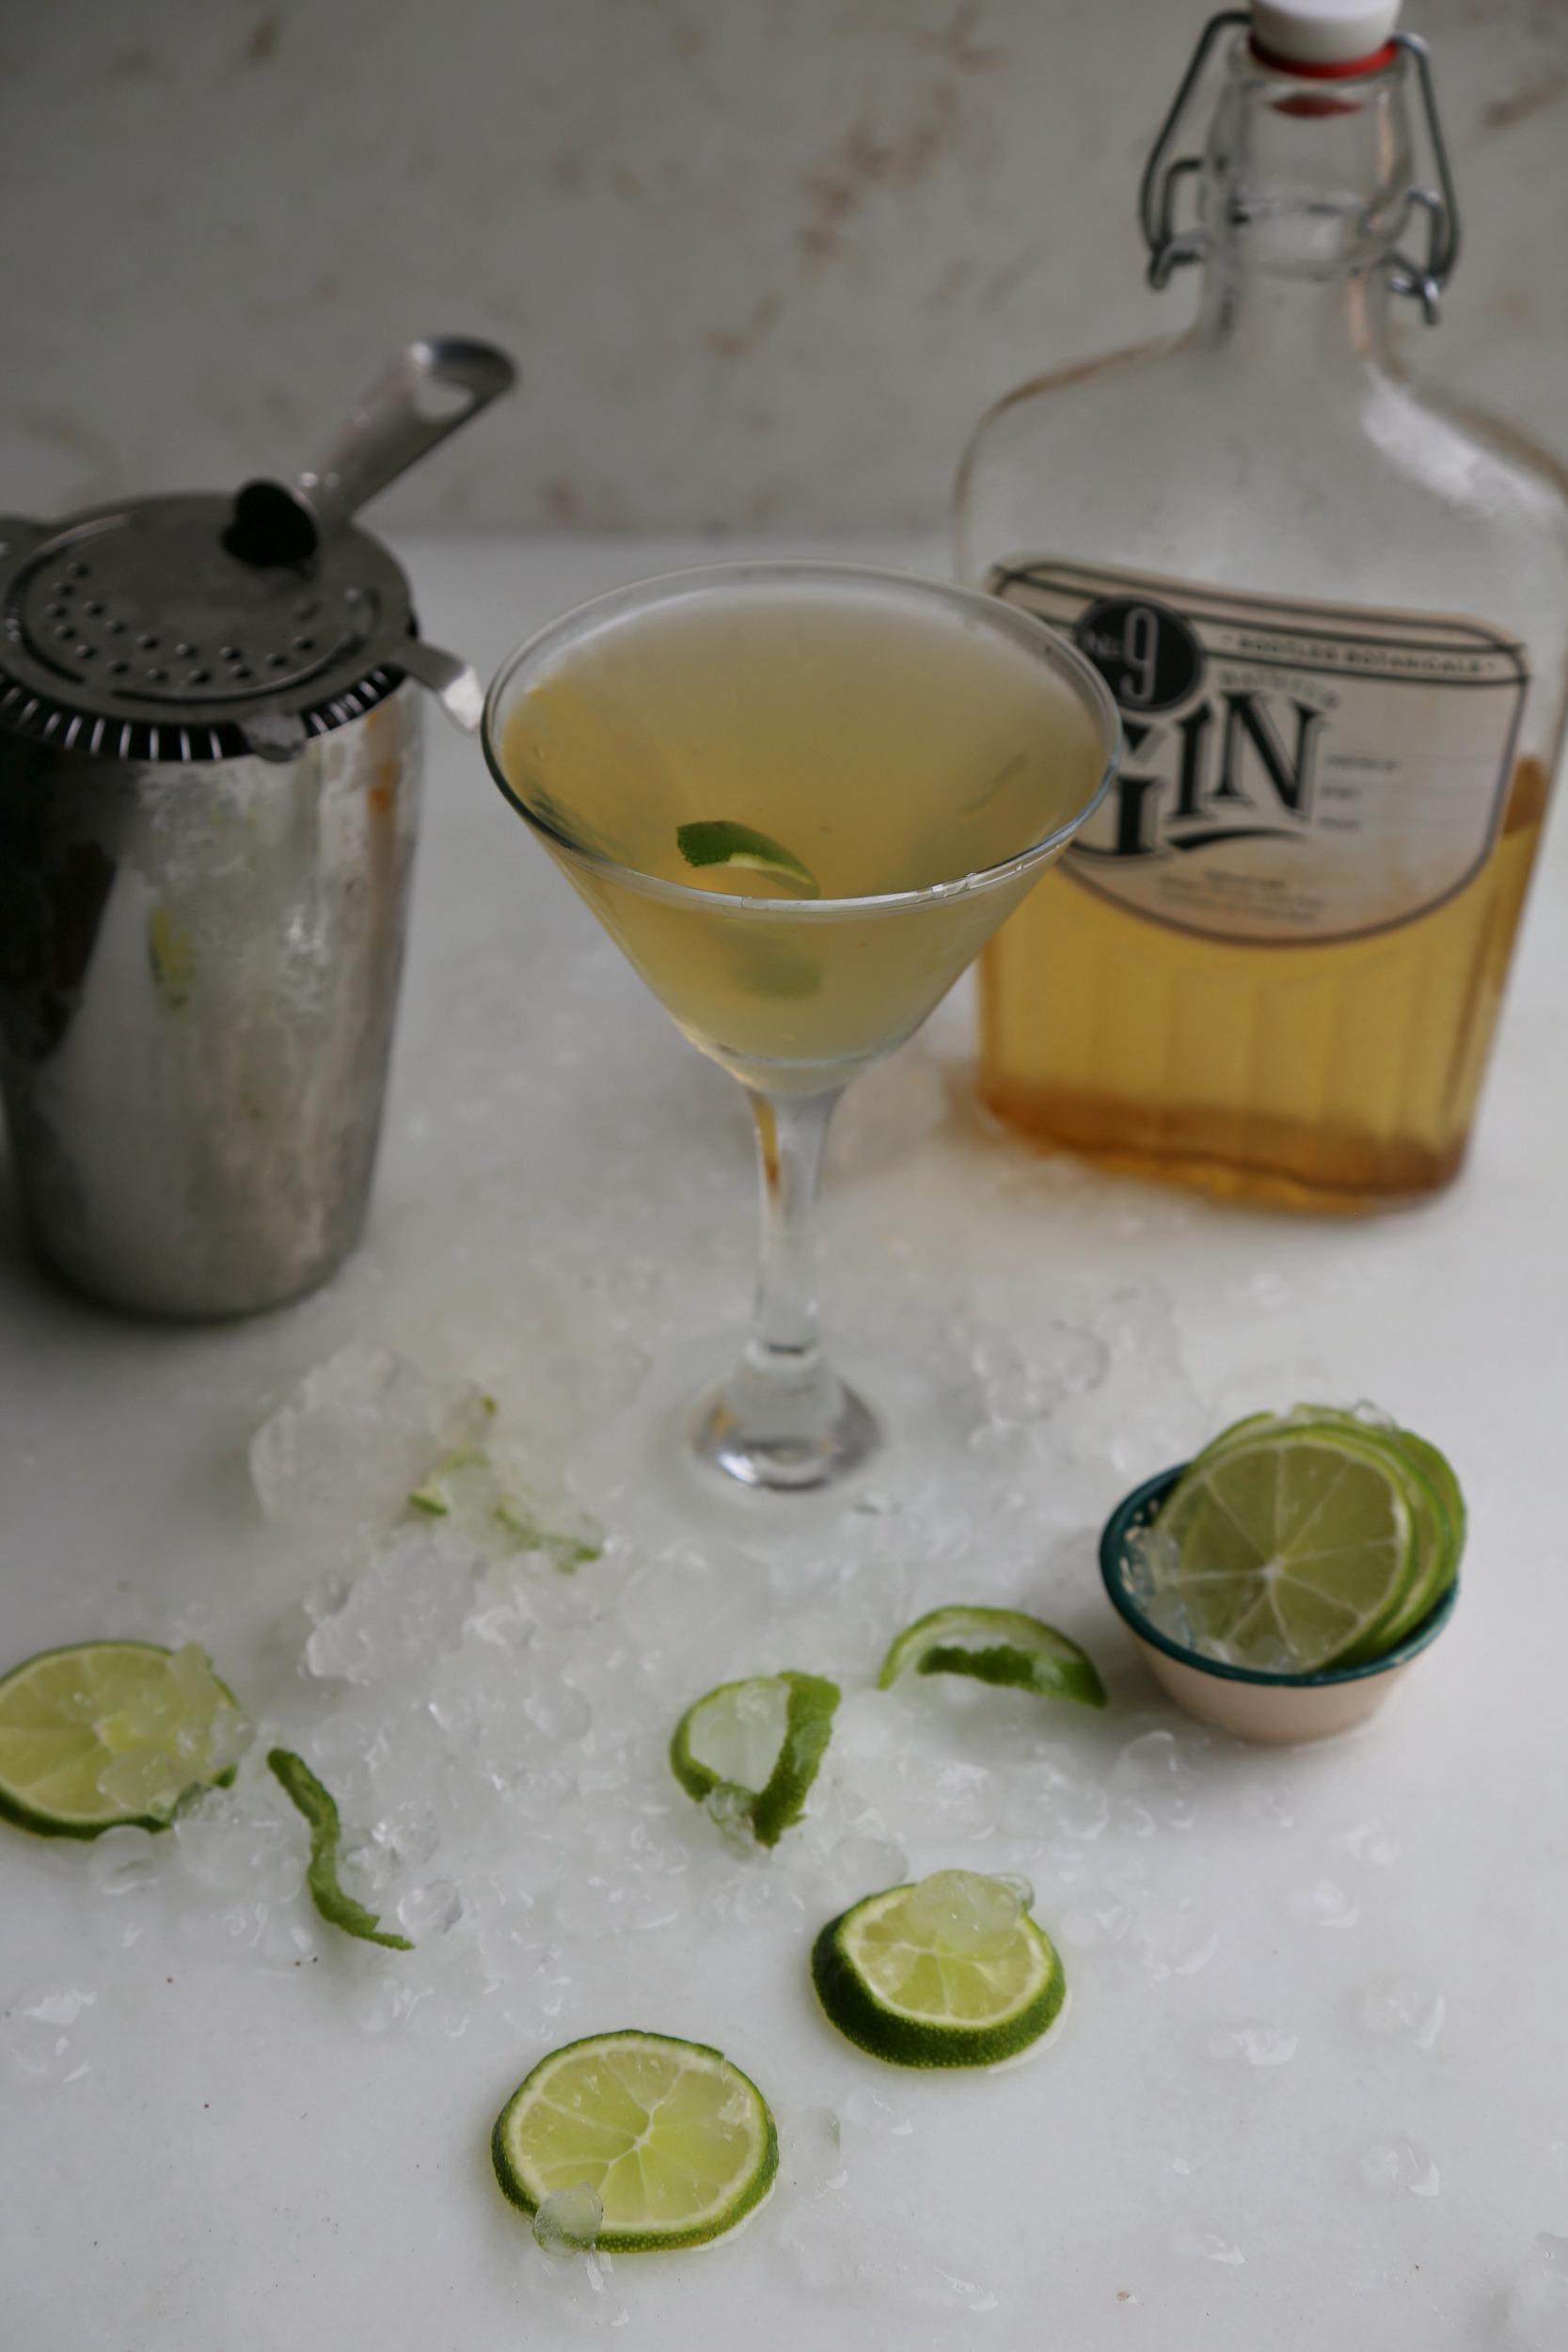 coriander-lime-martinez-cocktail-vianneyrodriguez-sweetlifebake